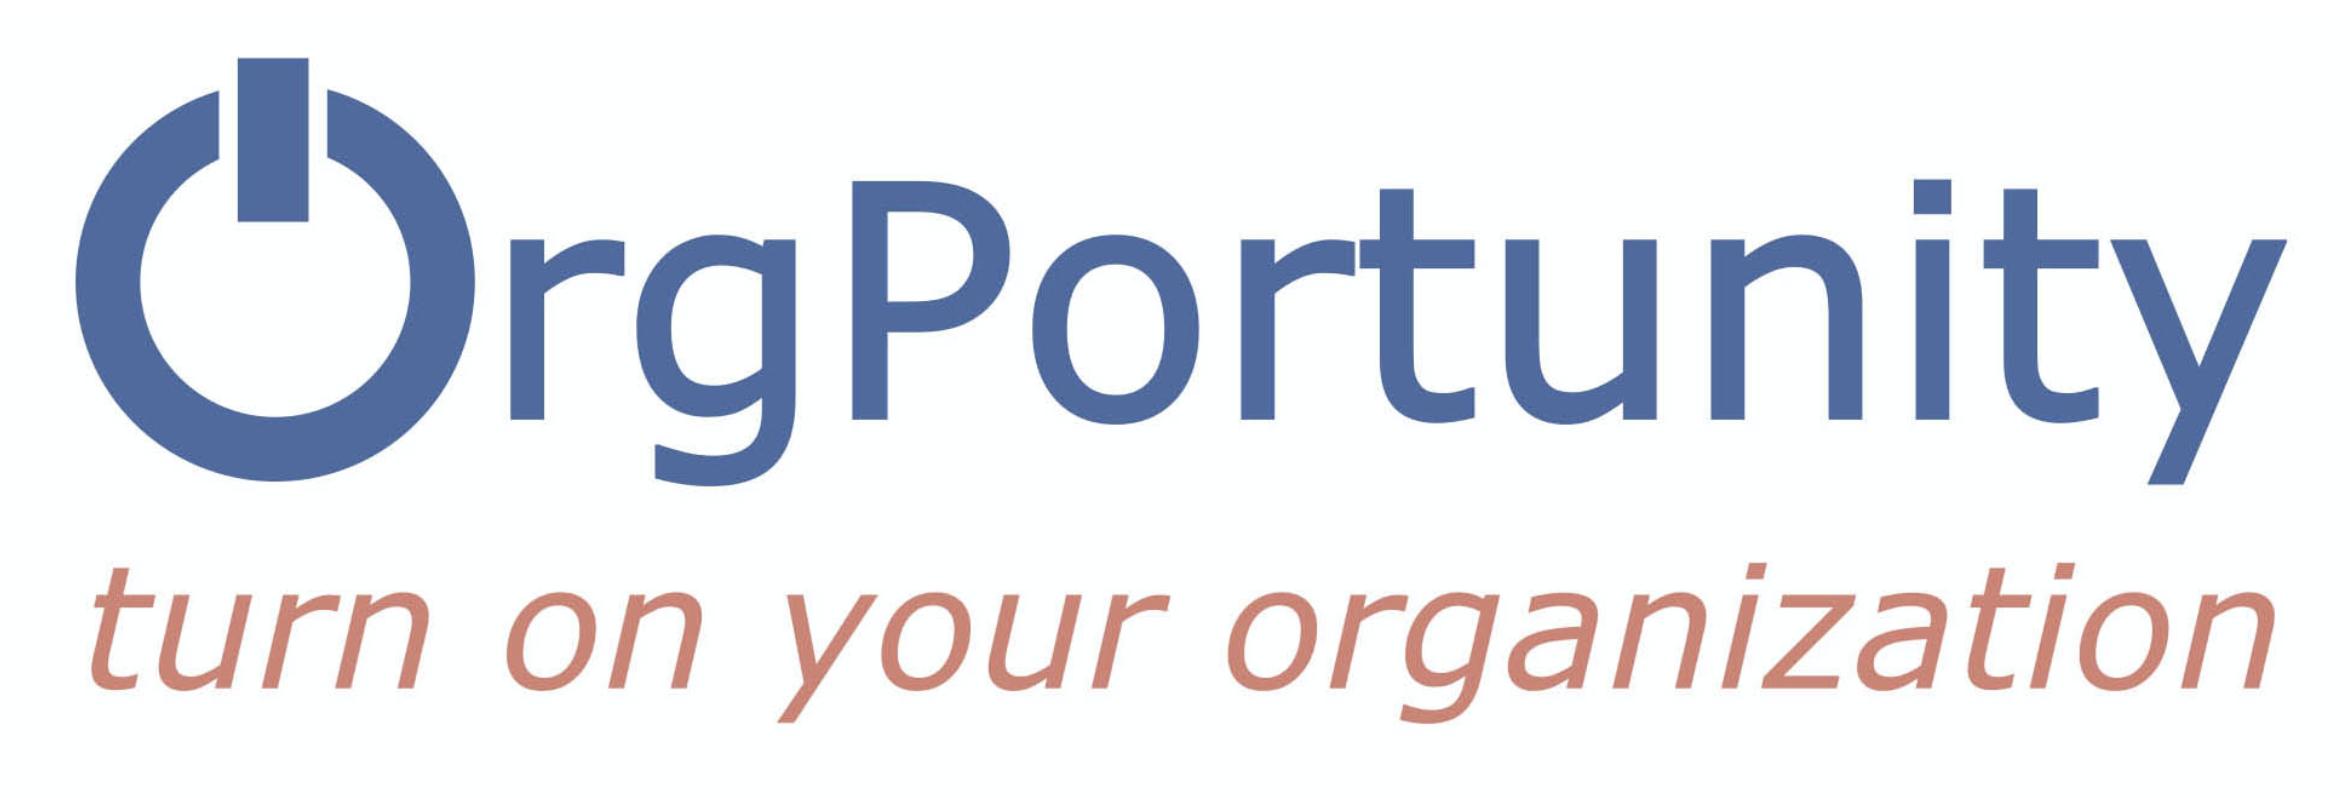 OrgPortunity Logo